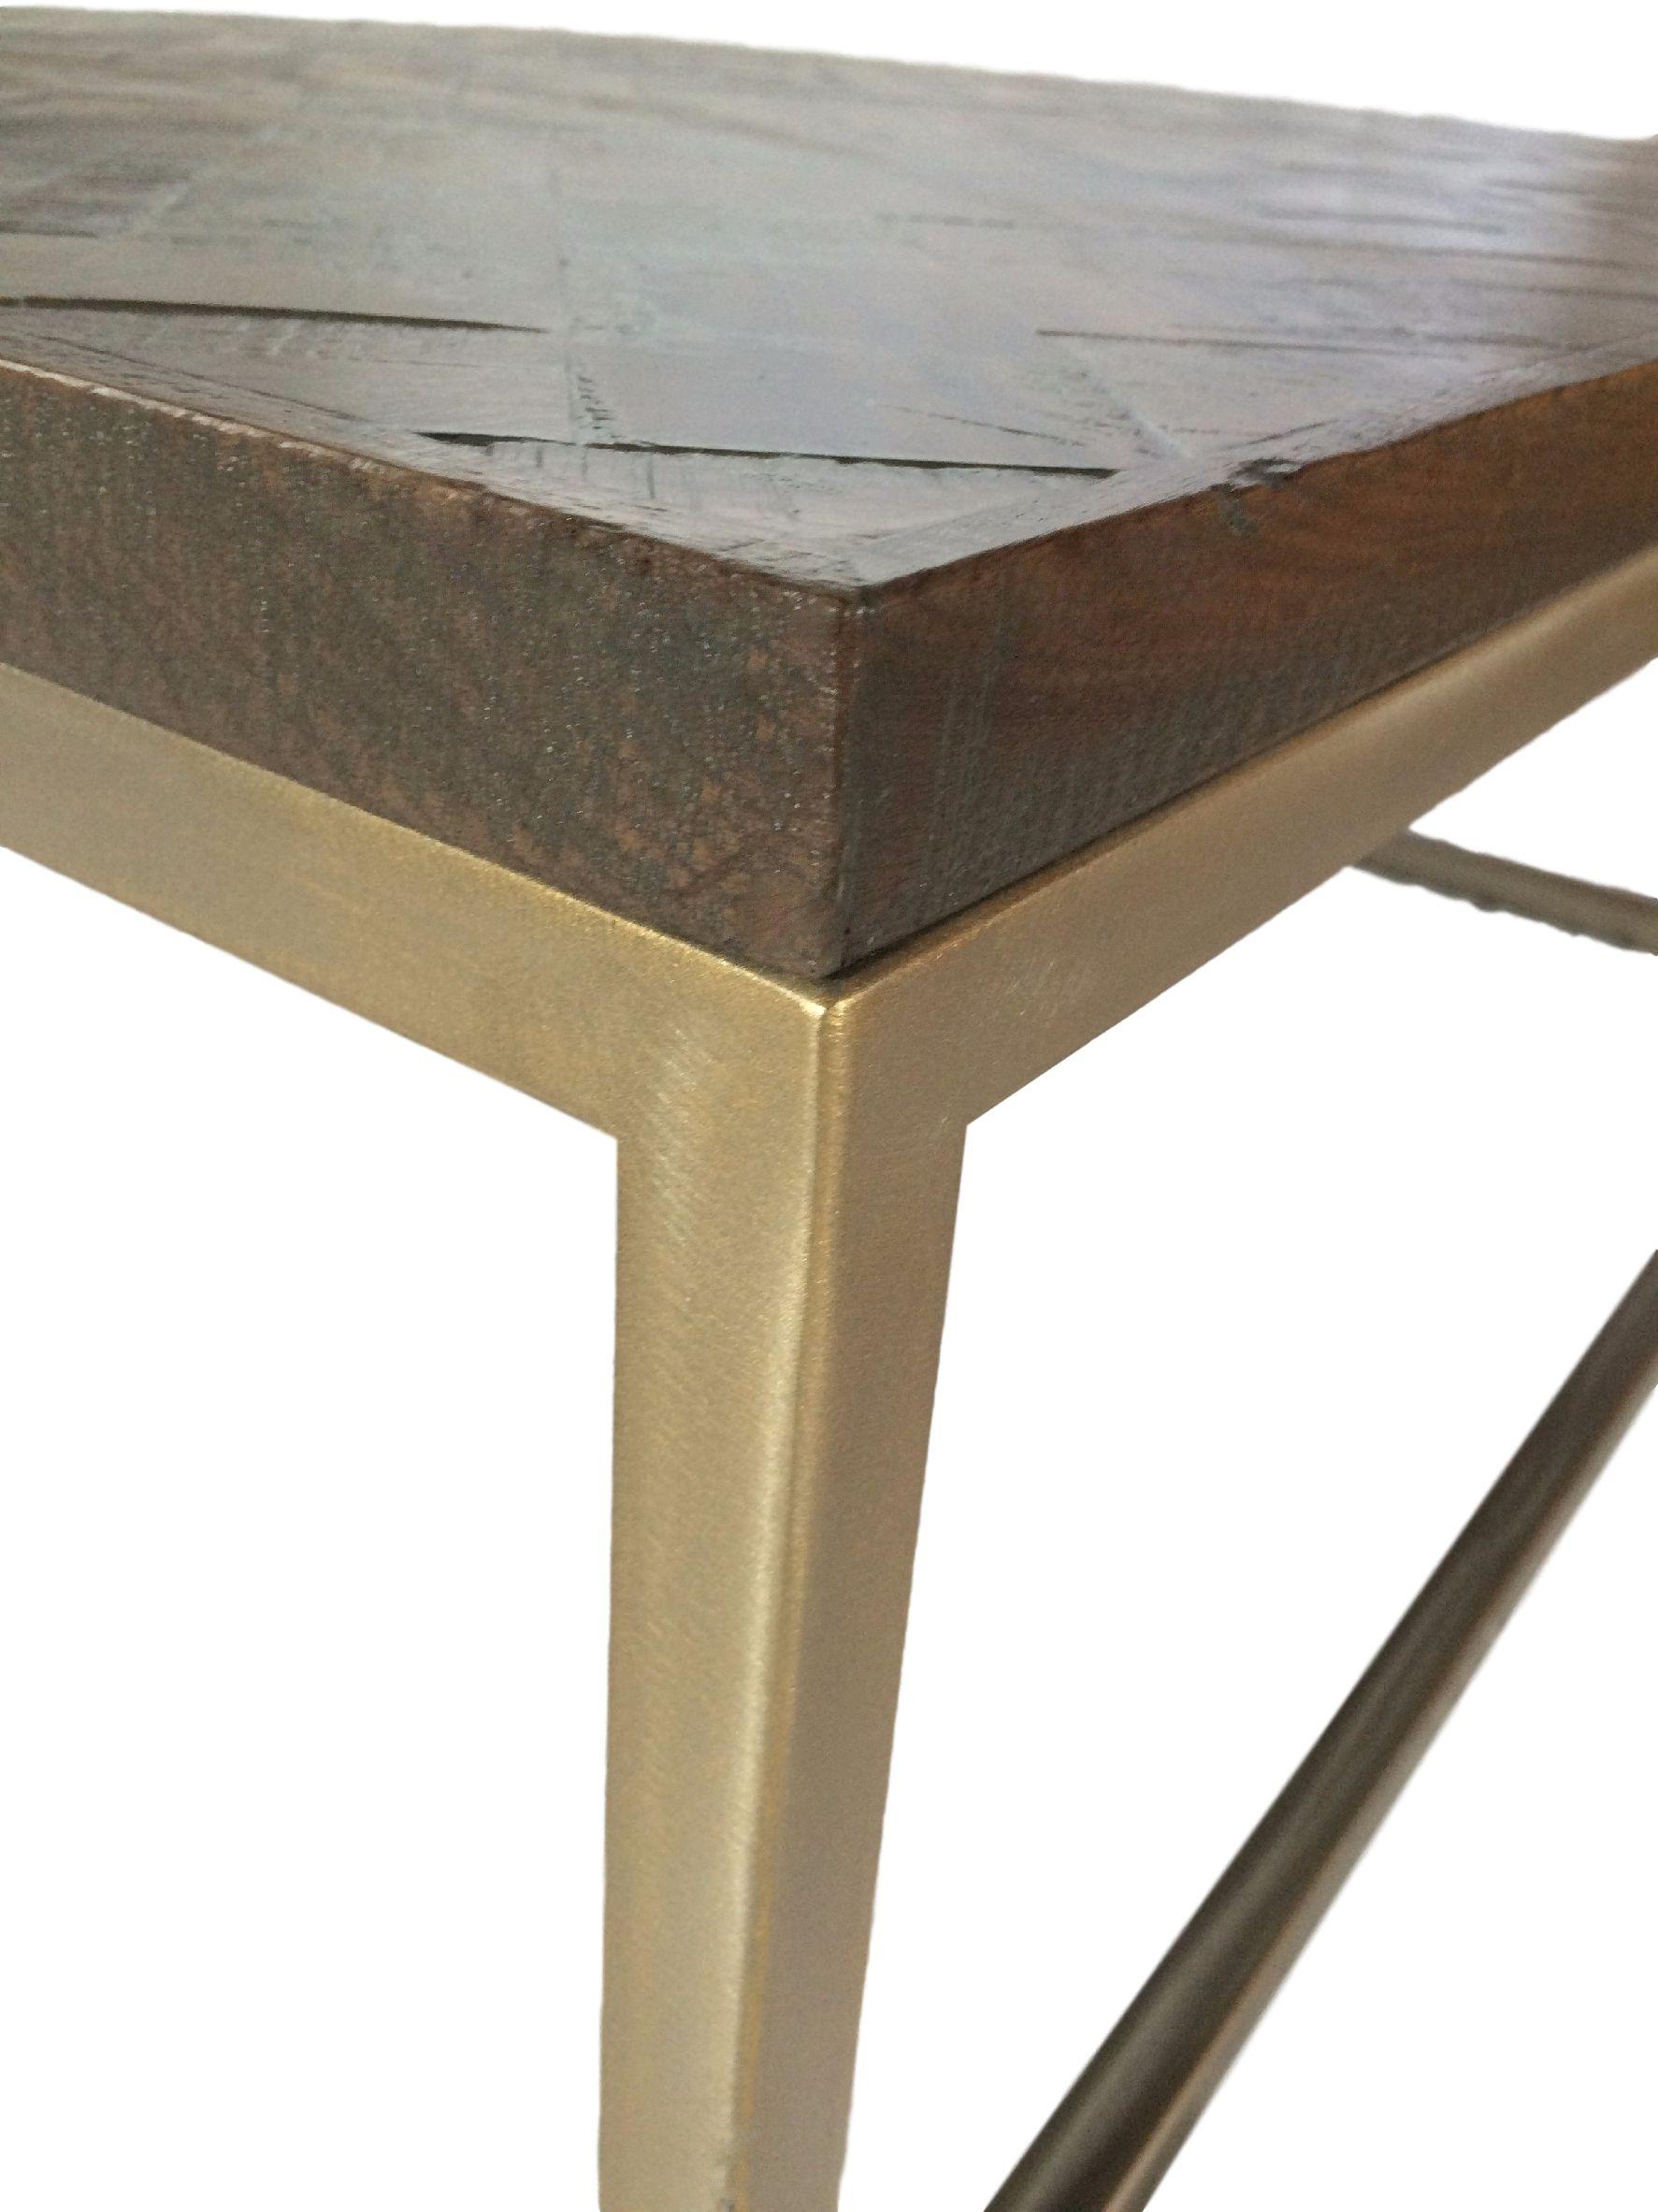 Buy a Custom Herringbone Coffee Table made to order from